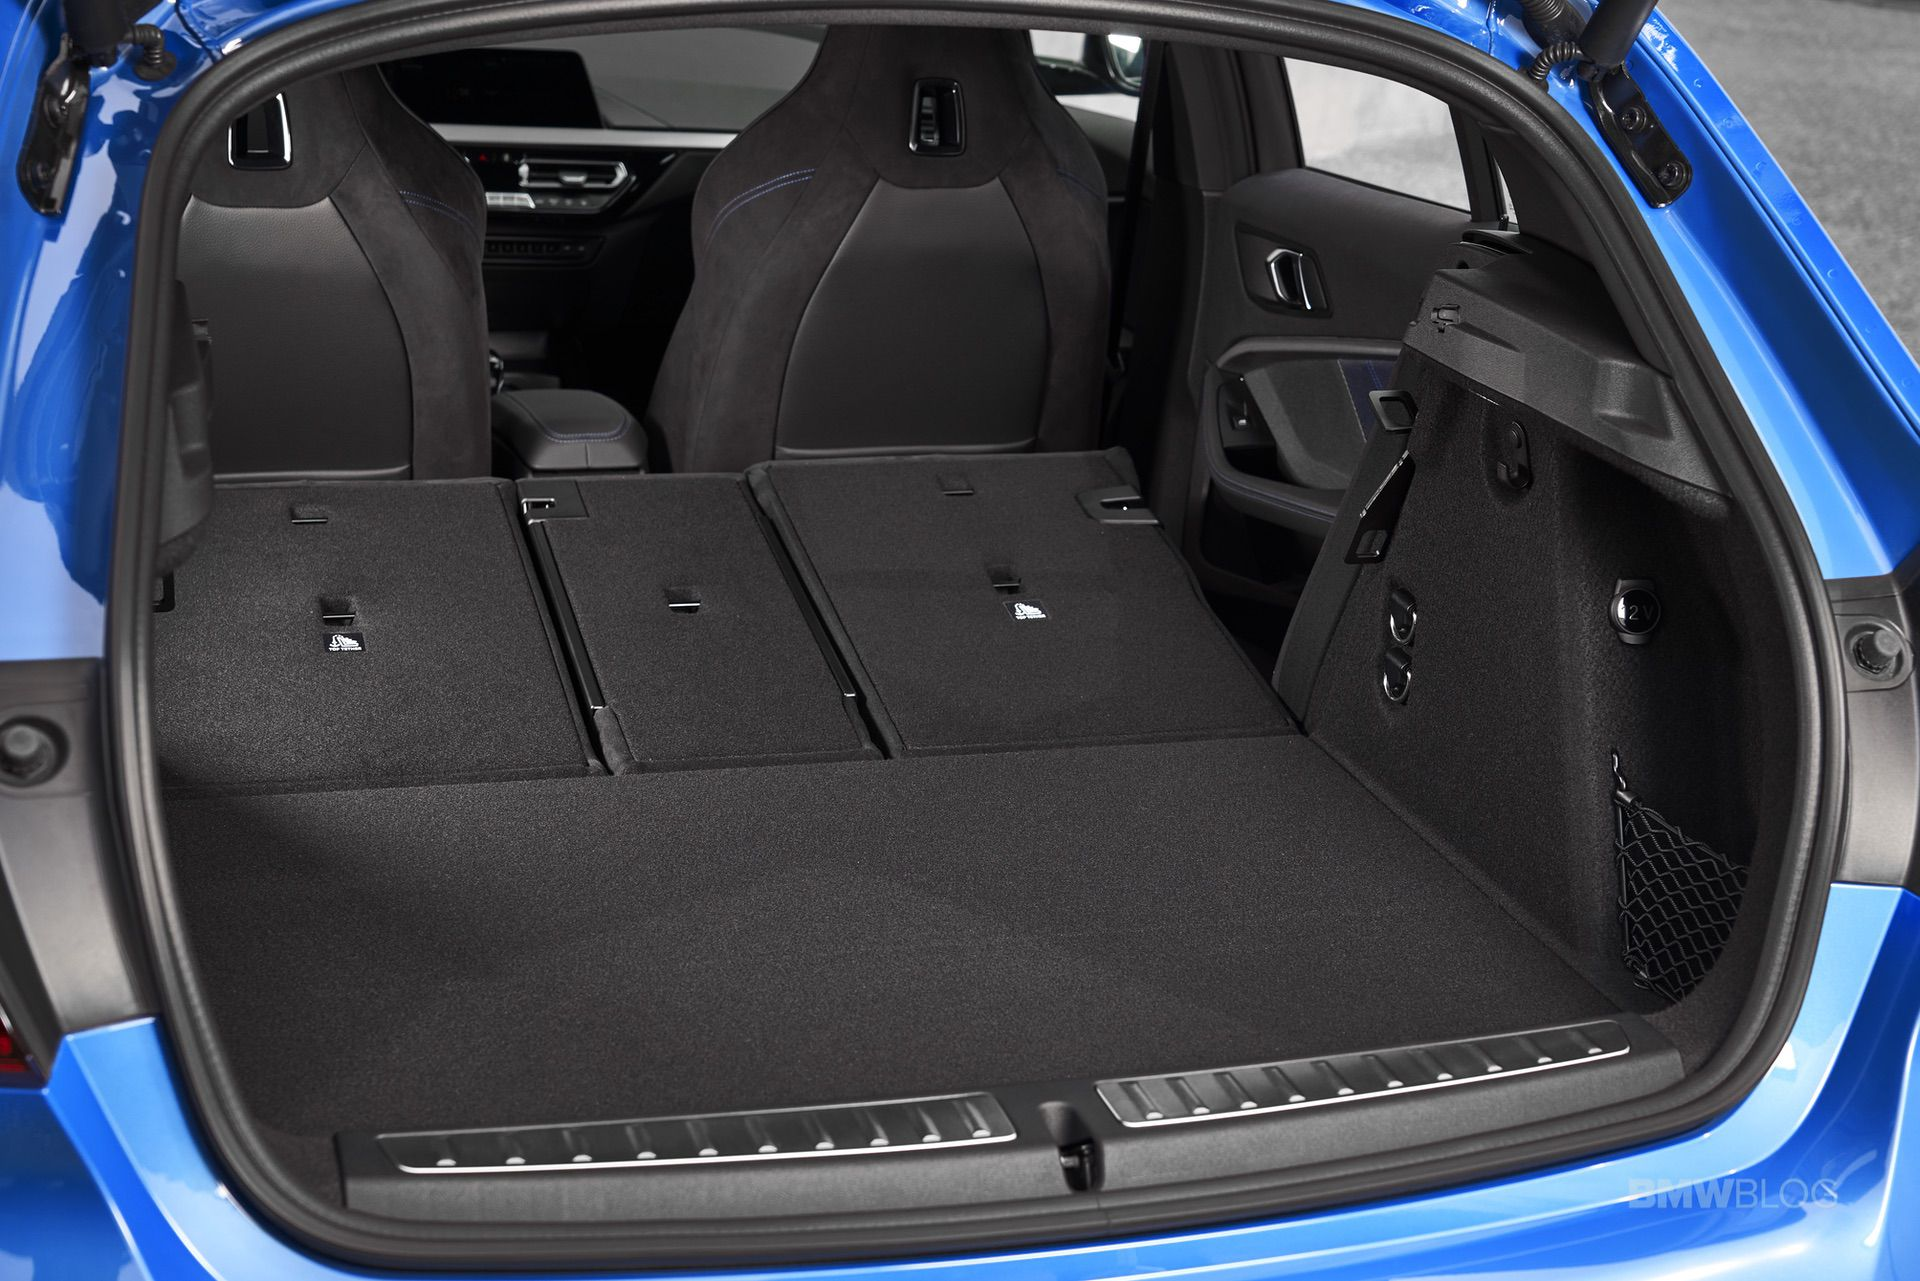 2020-BMW-M135i-xDrive-Misano-Blue-33.jpg